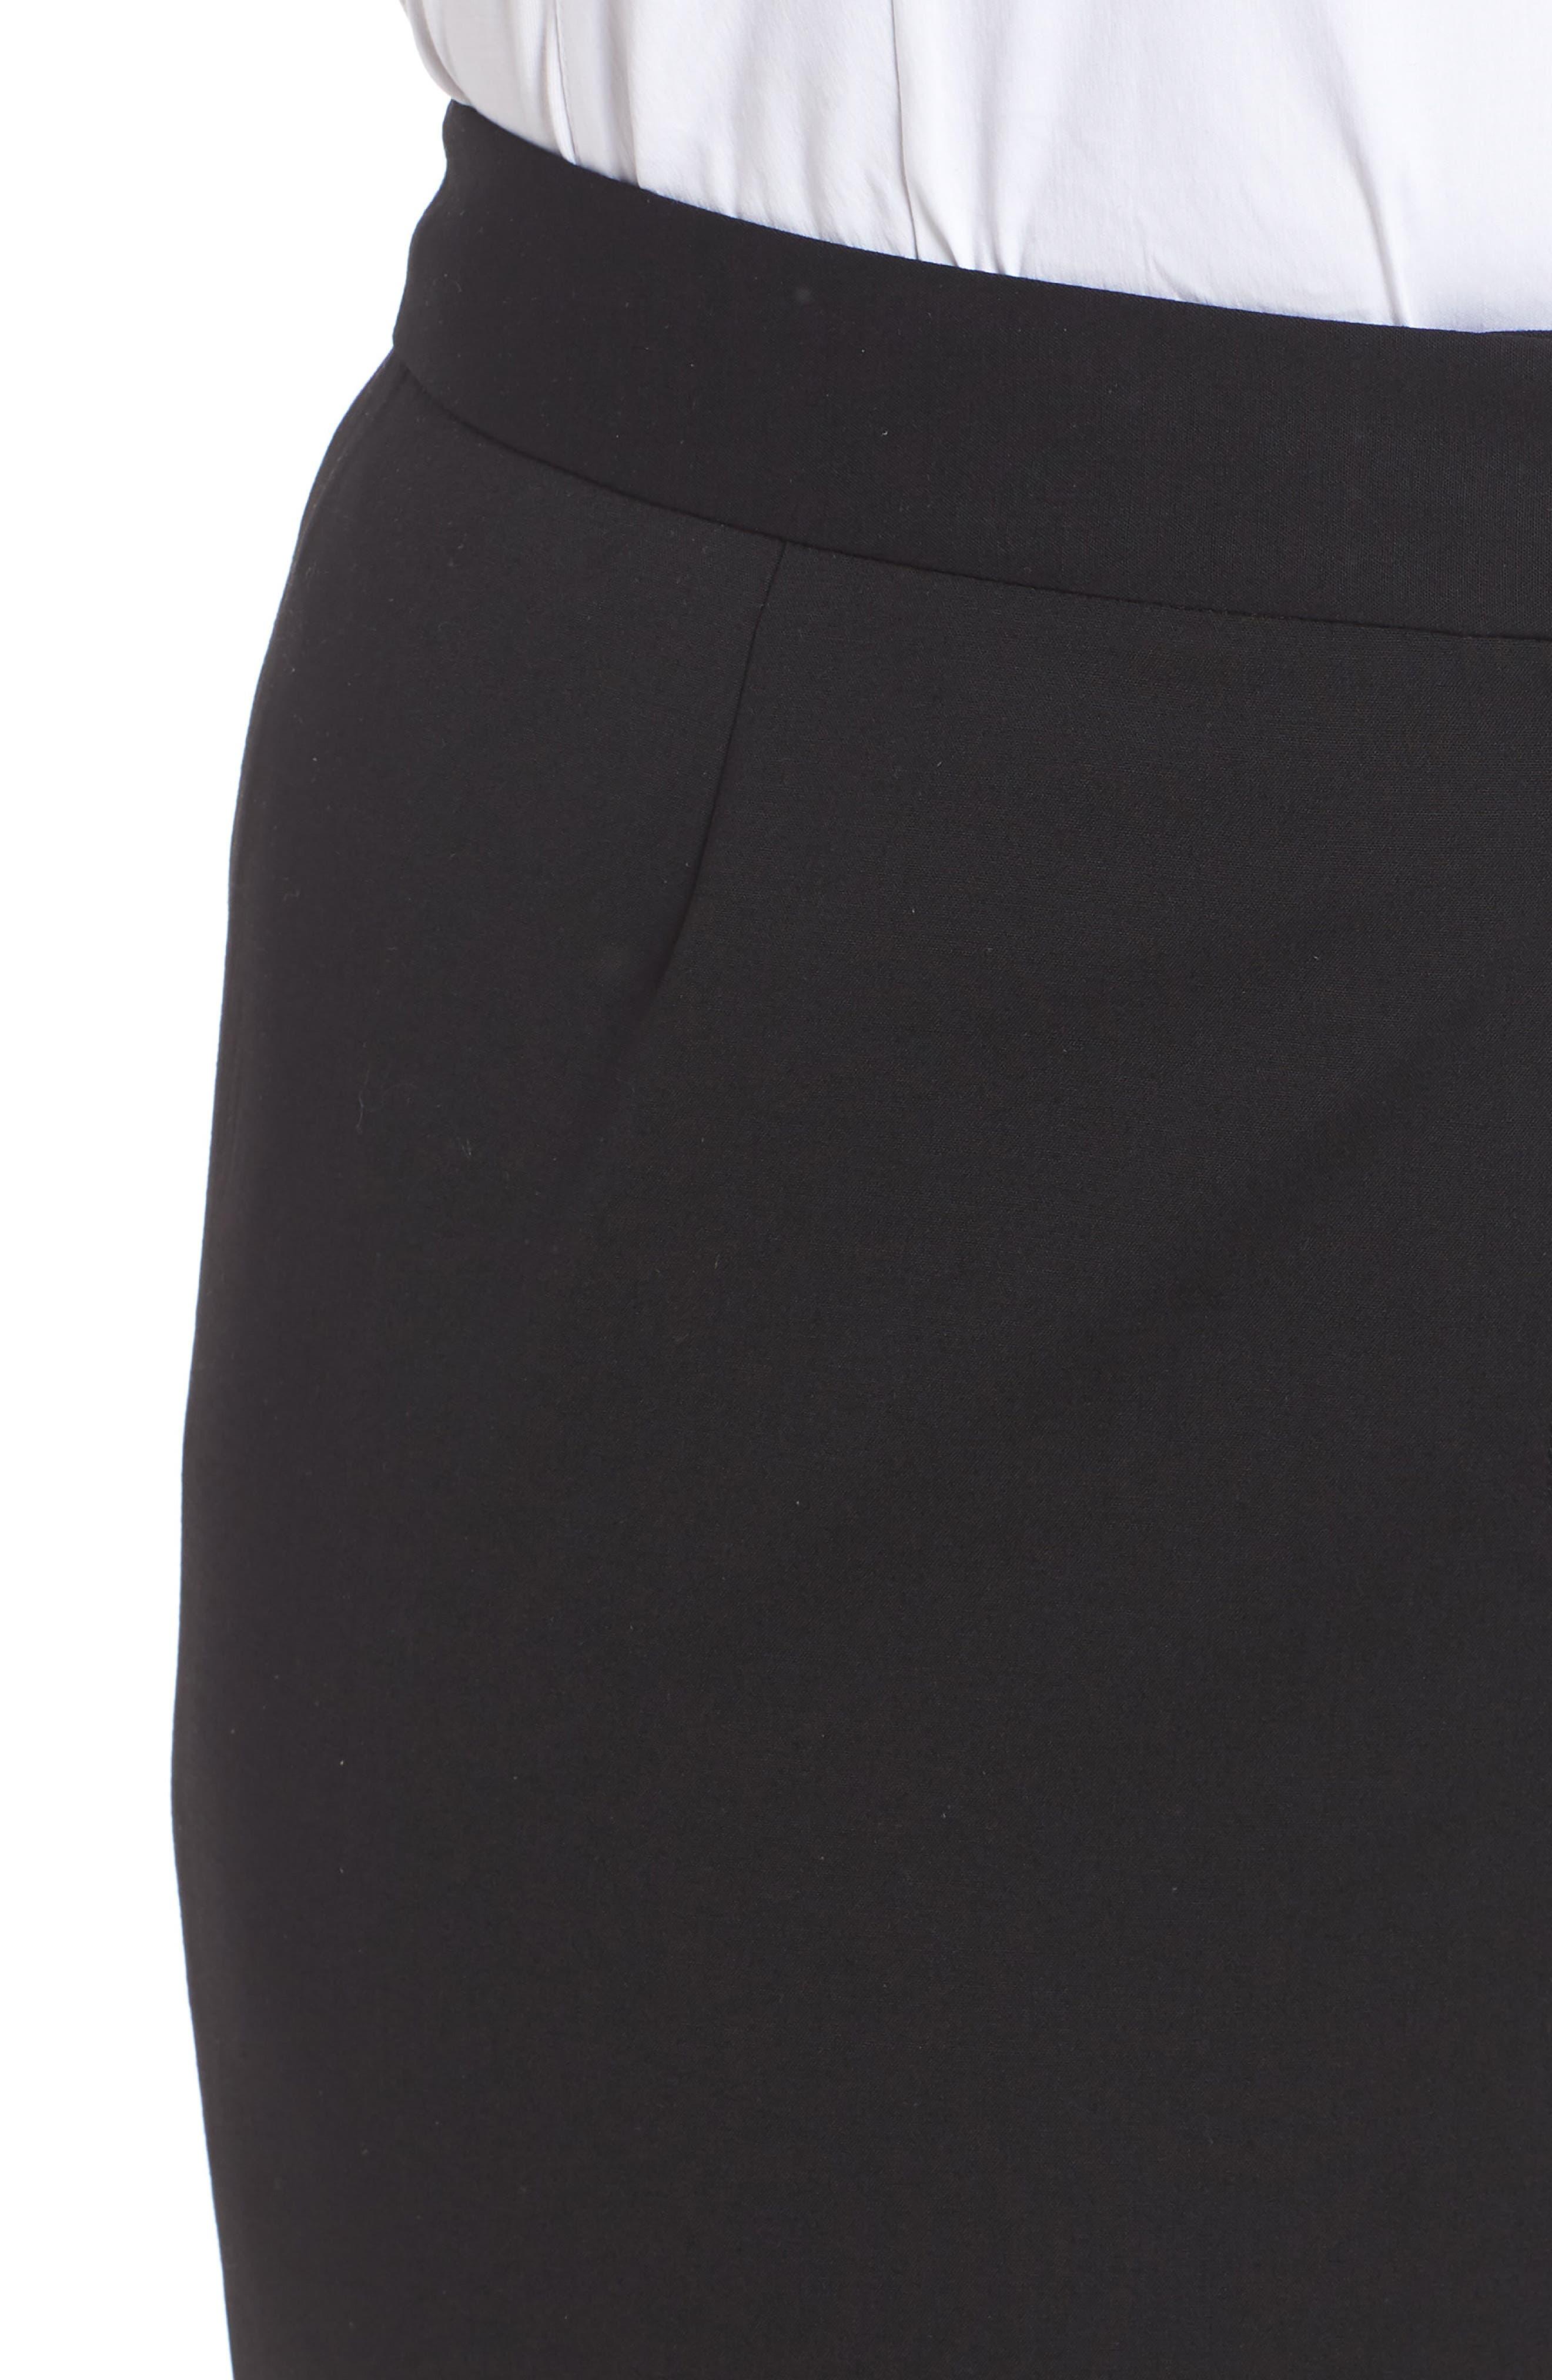 Menswear Trousers,                             Alternate thumbnail 6, color,                             BLACK